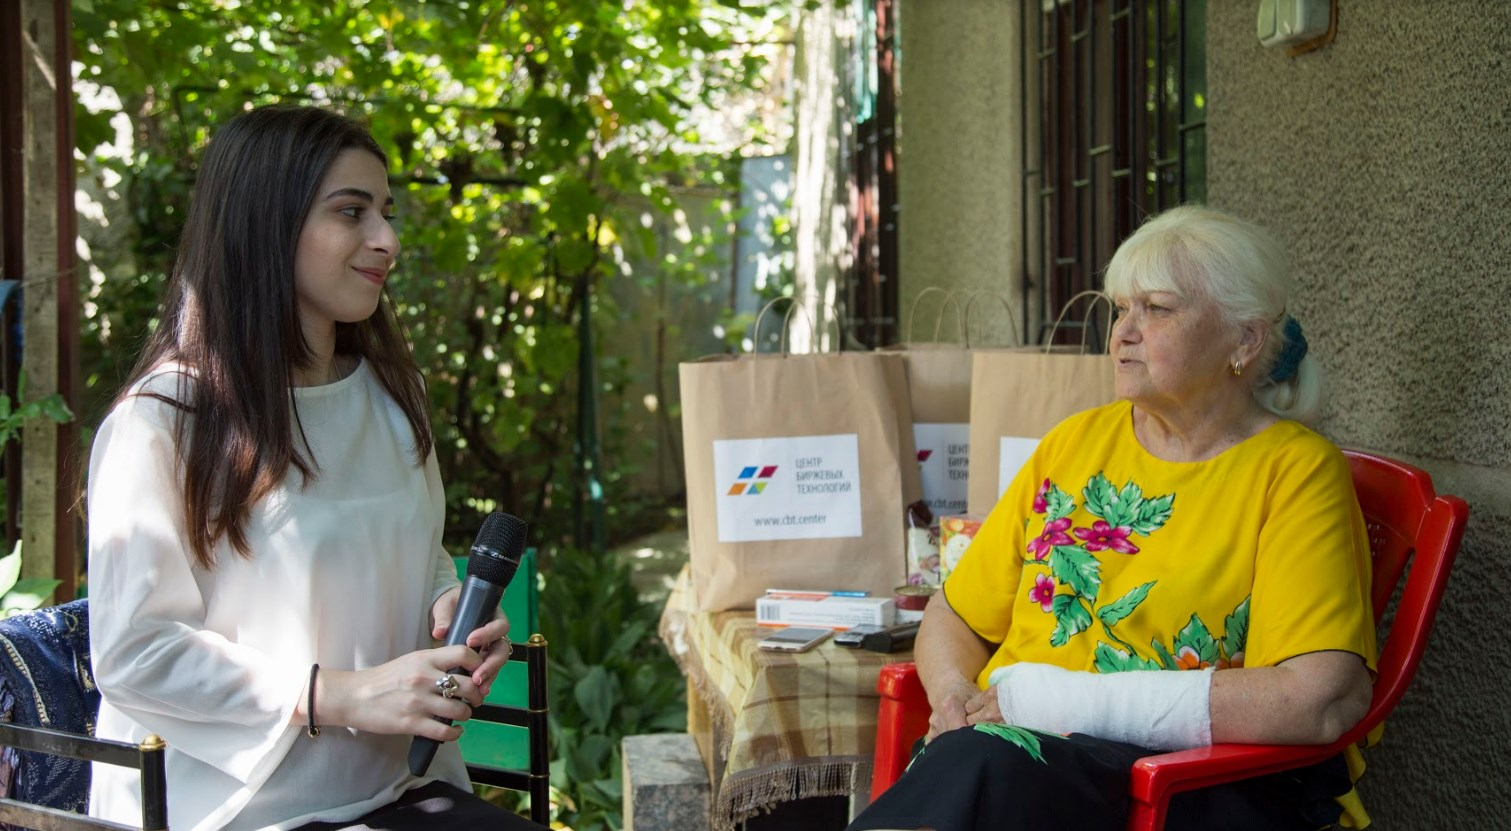 Центр Биржевых Технологий оказал помощь одинокой пенсионерке